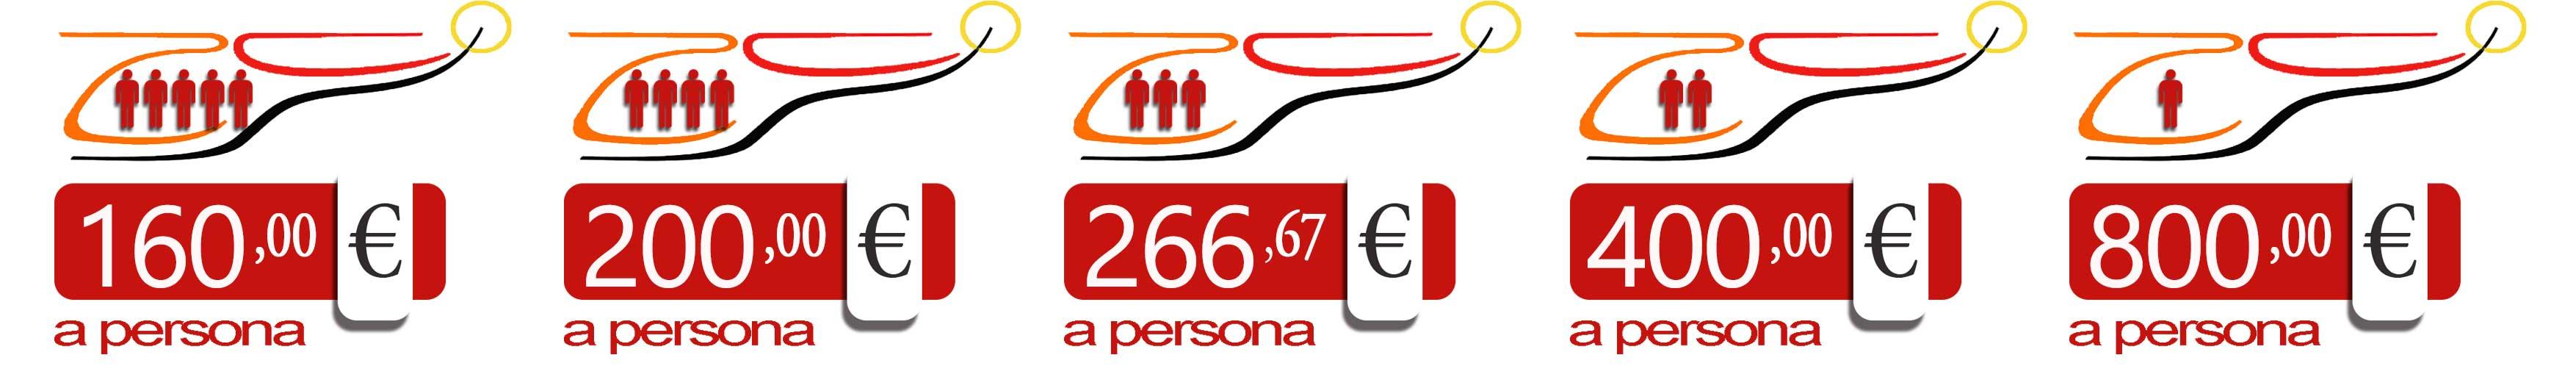 LISTINO_€ 160